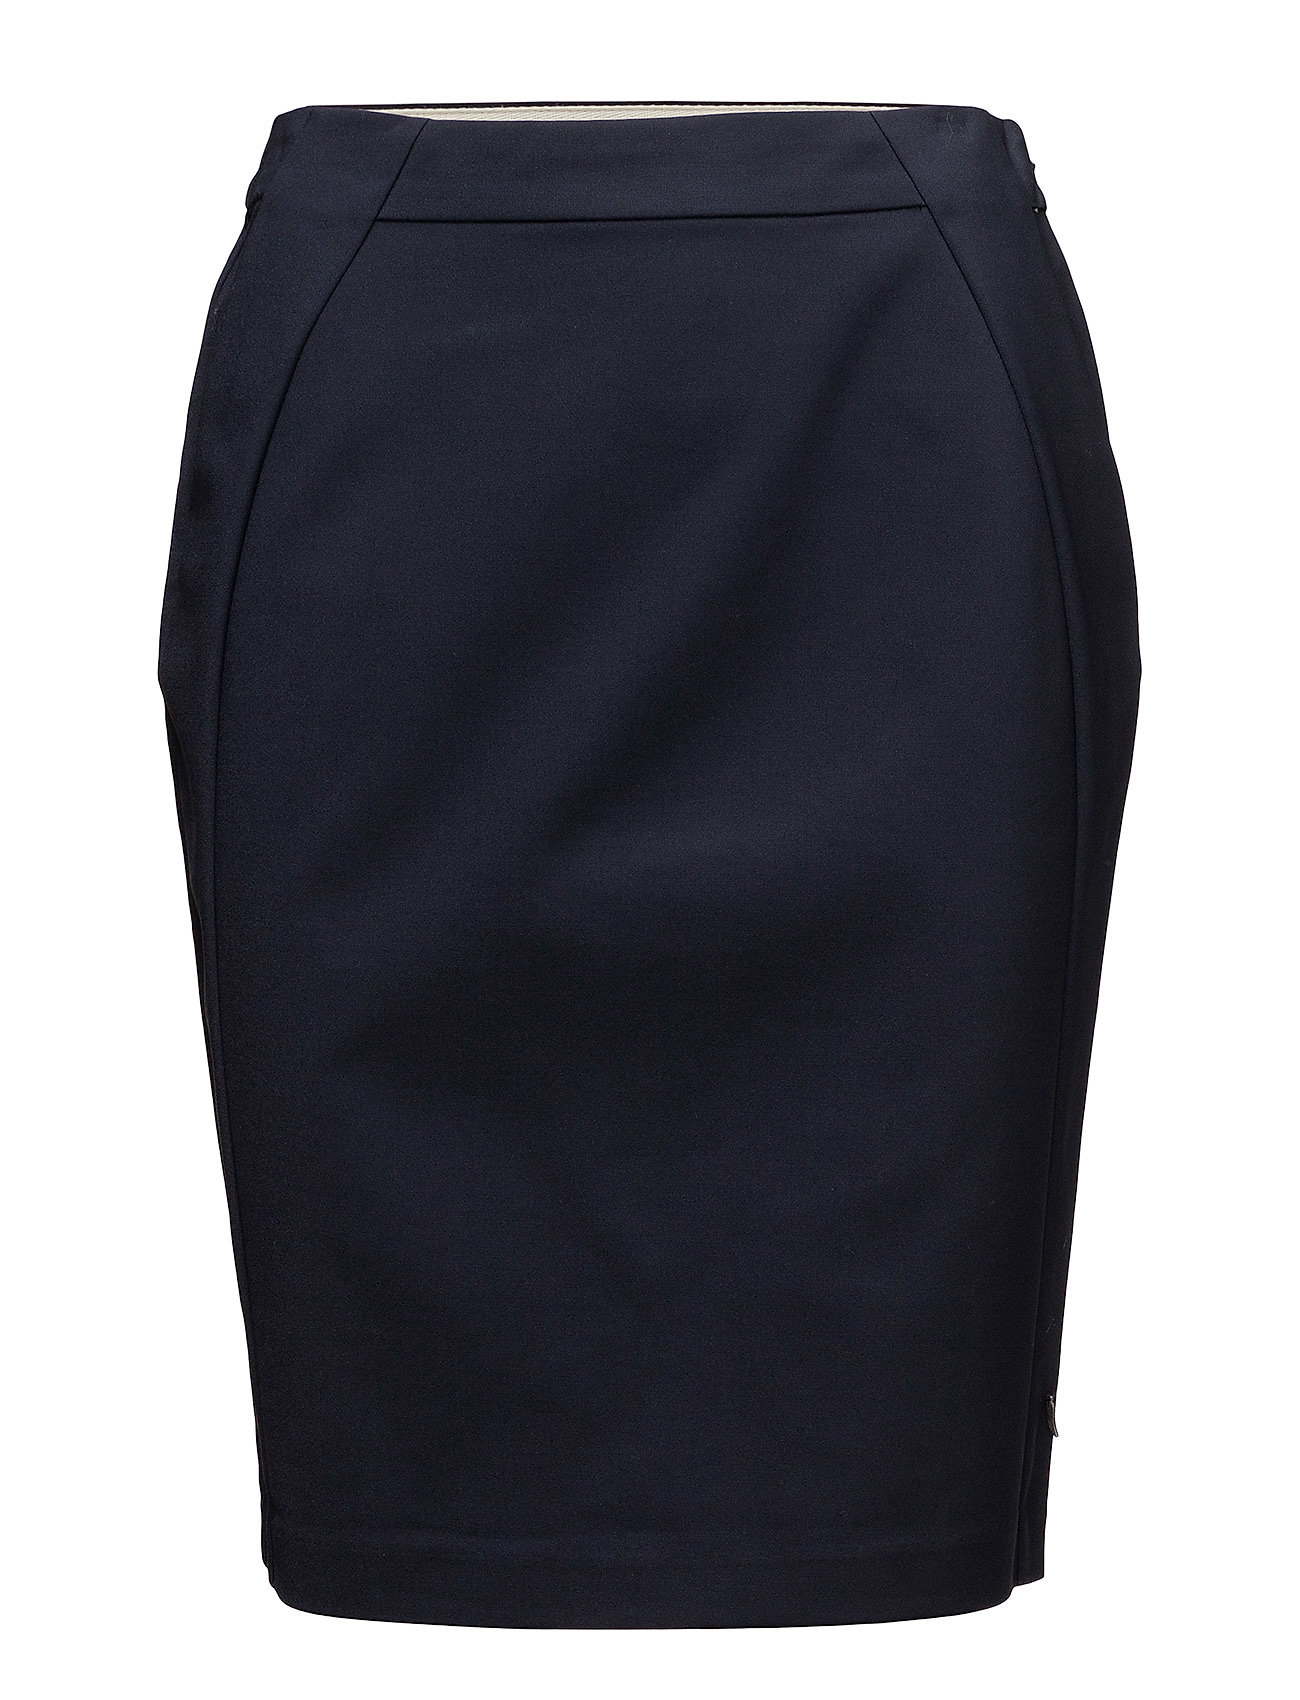 Skirt - Coster Copenhagen